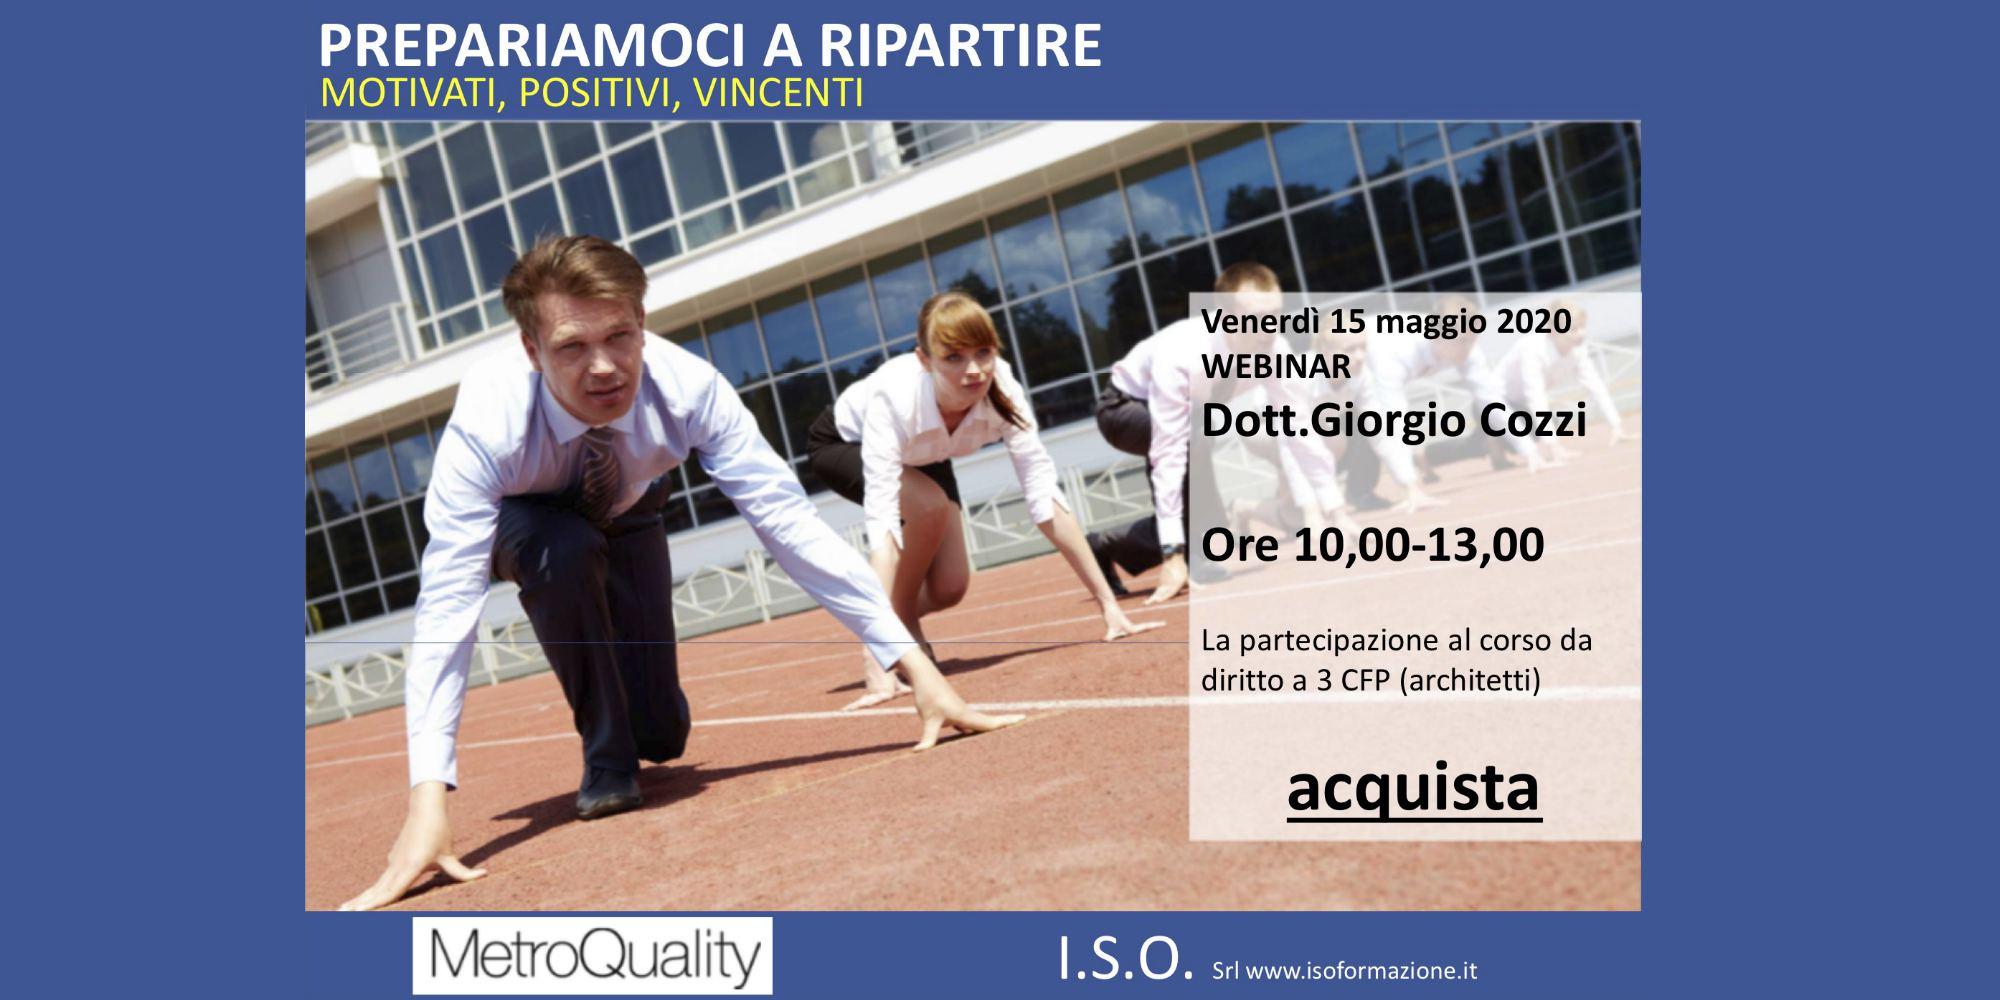 MetroQuality Locandina Webinar 15 Maggio 2020